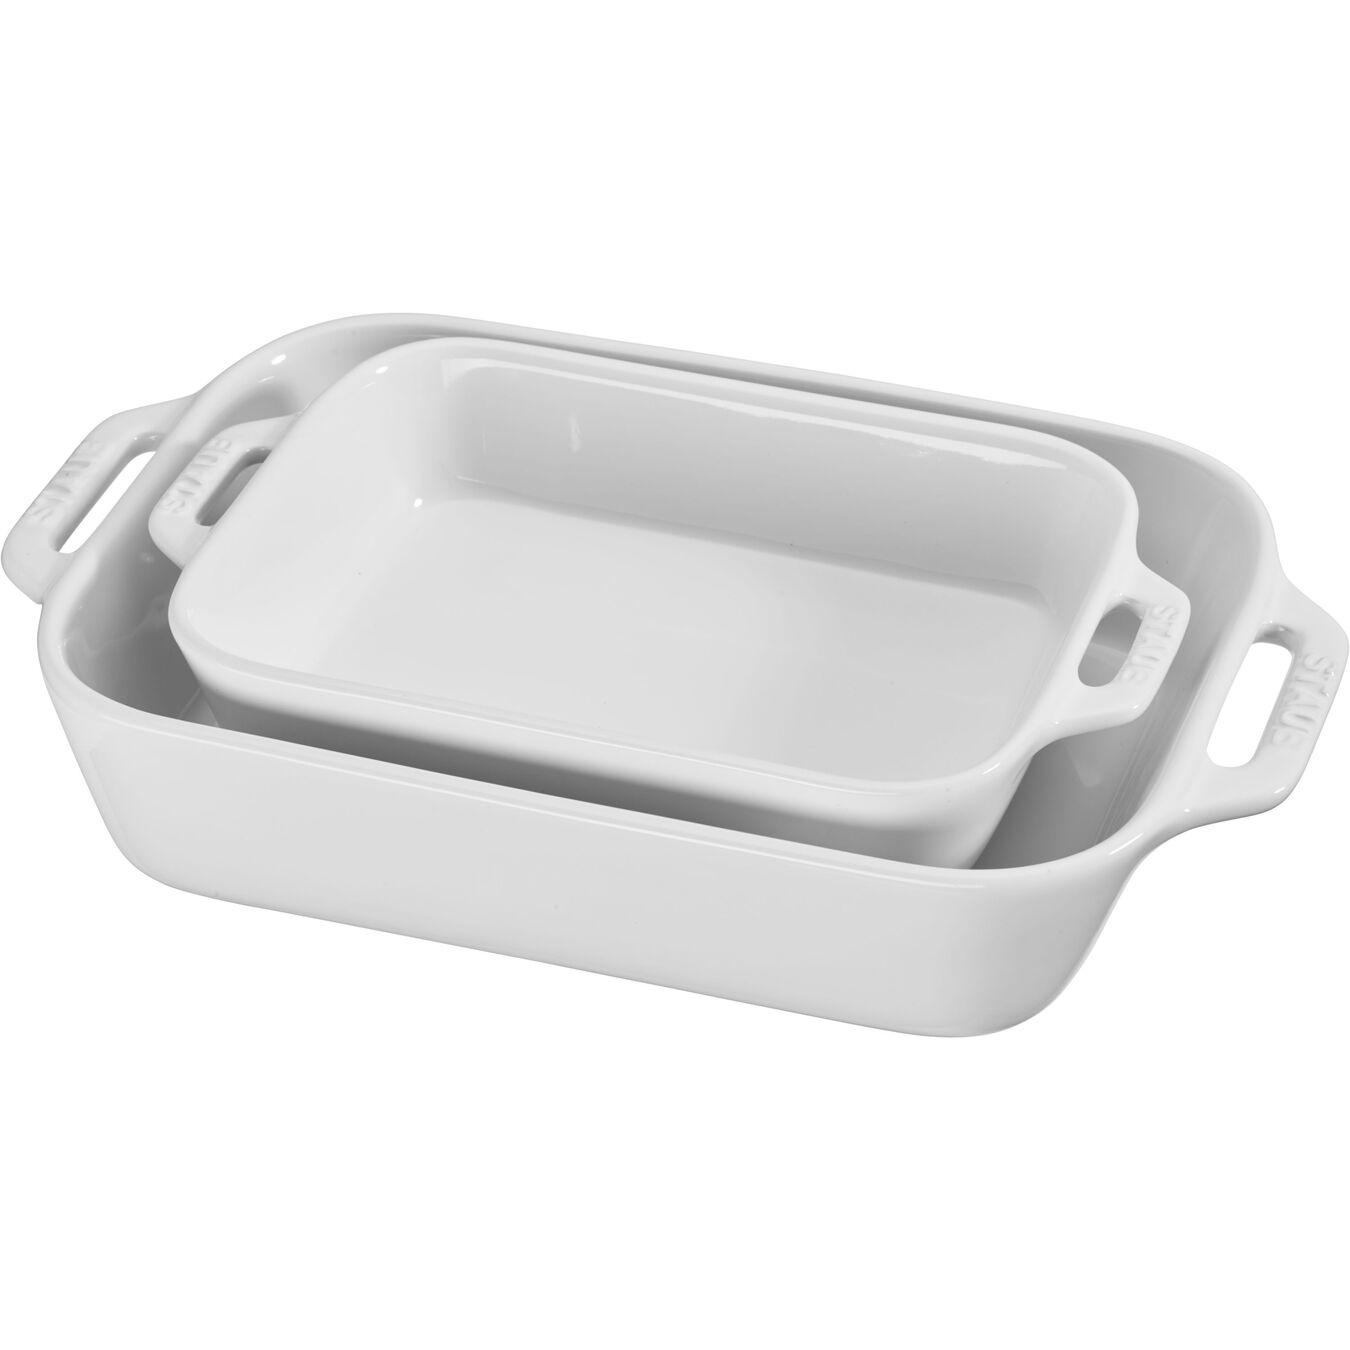 2-pc, Ovenware set, white,,large 1